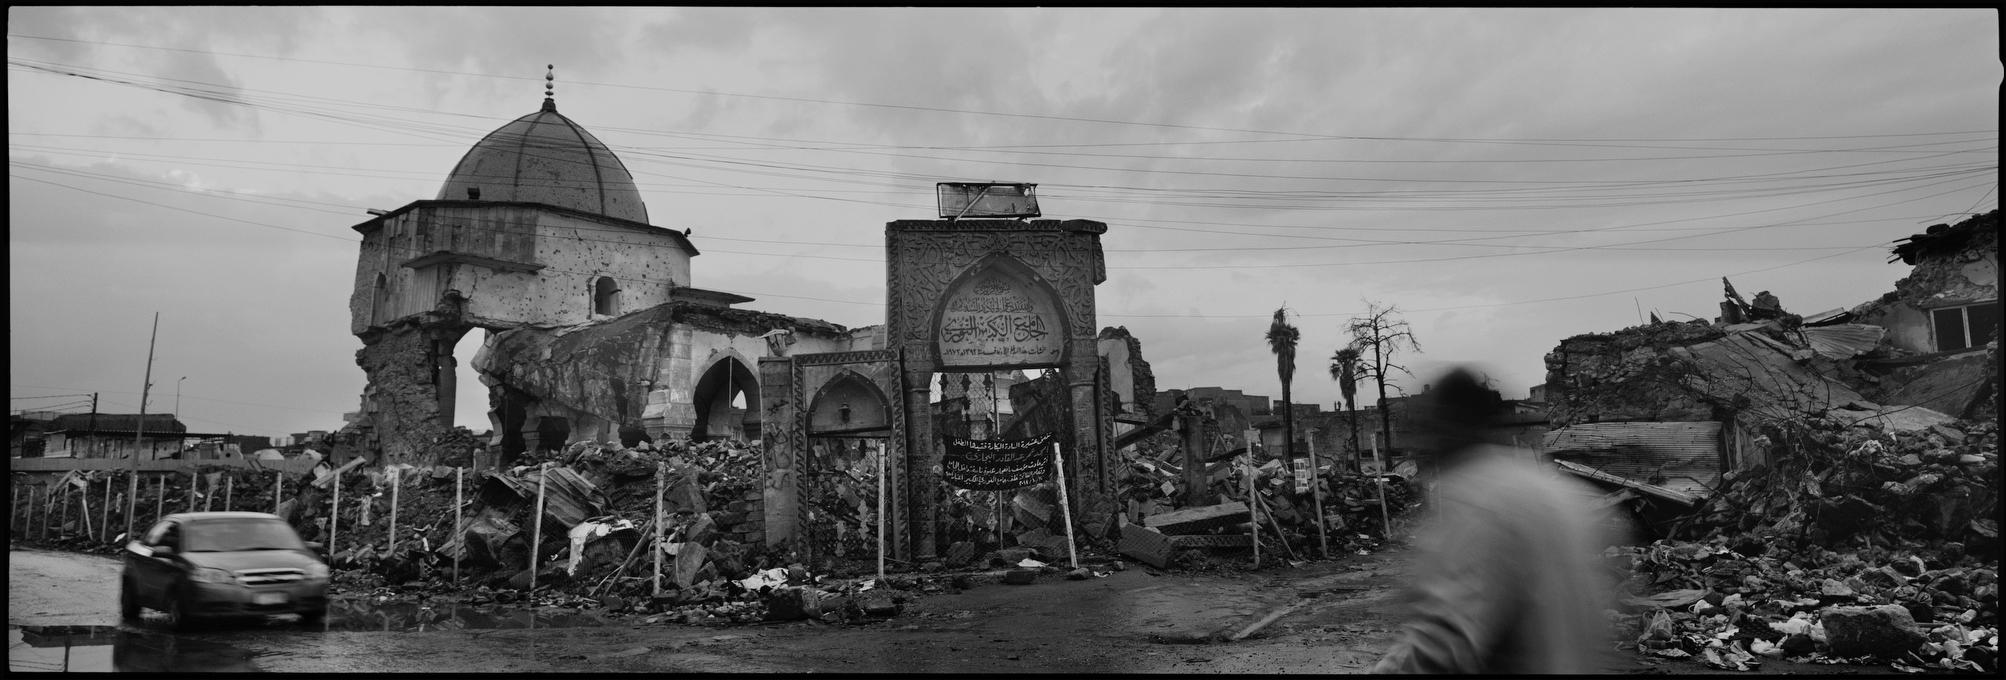 Mosul, Iraq. November, 2018.